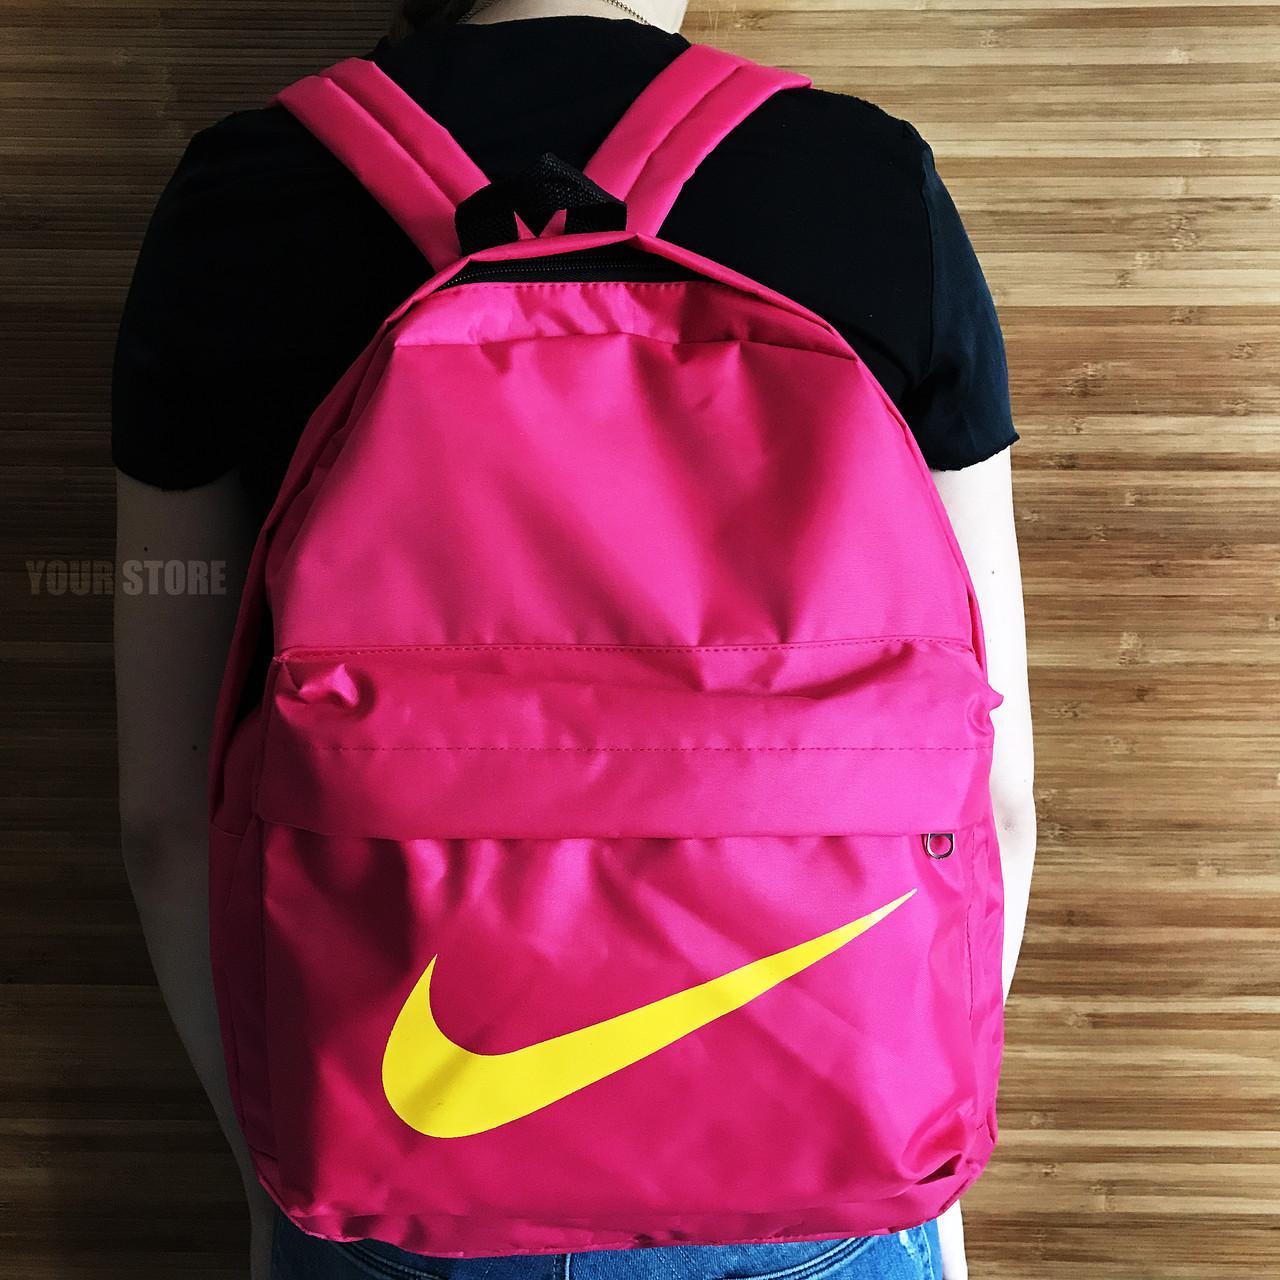 47cfd69a10d5 Женский спортивный рюкзак Nike розовый: 300 грн. - Рюкзаки Днепр ...